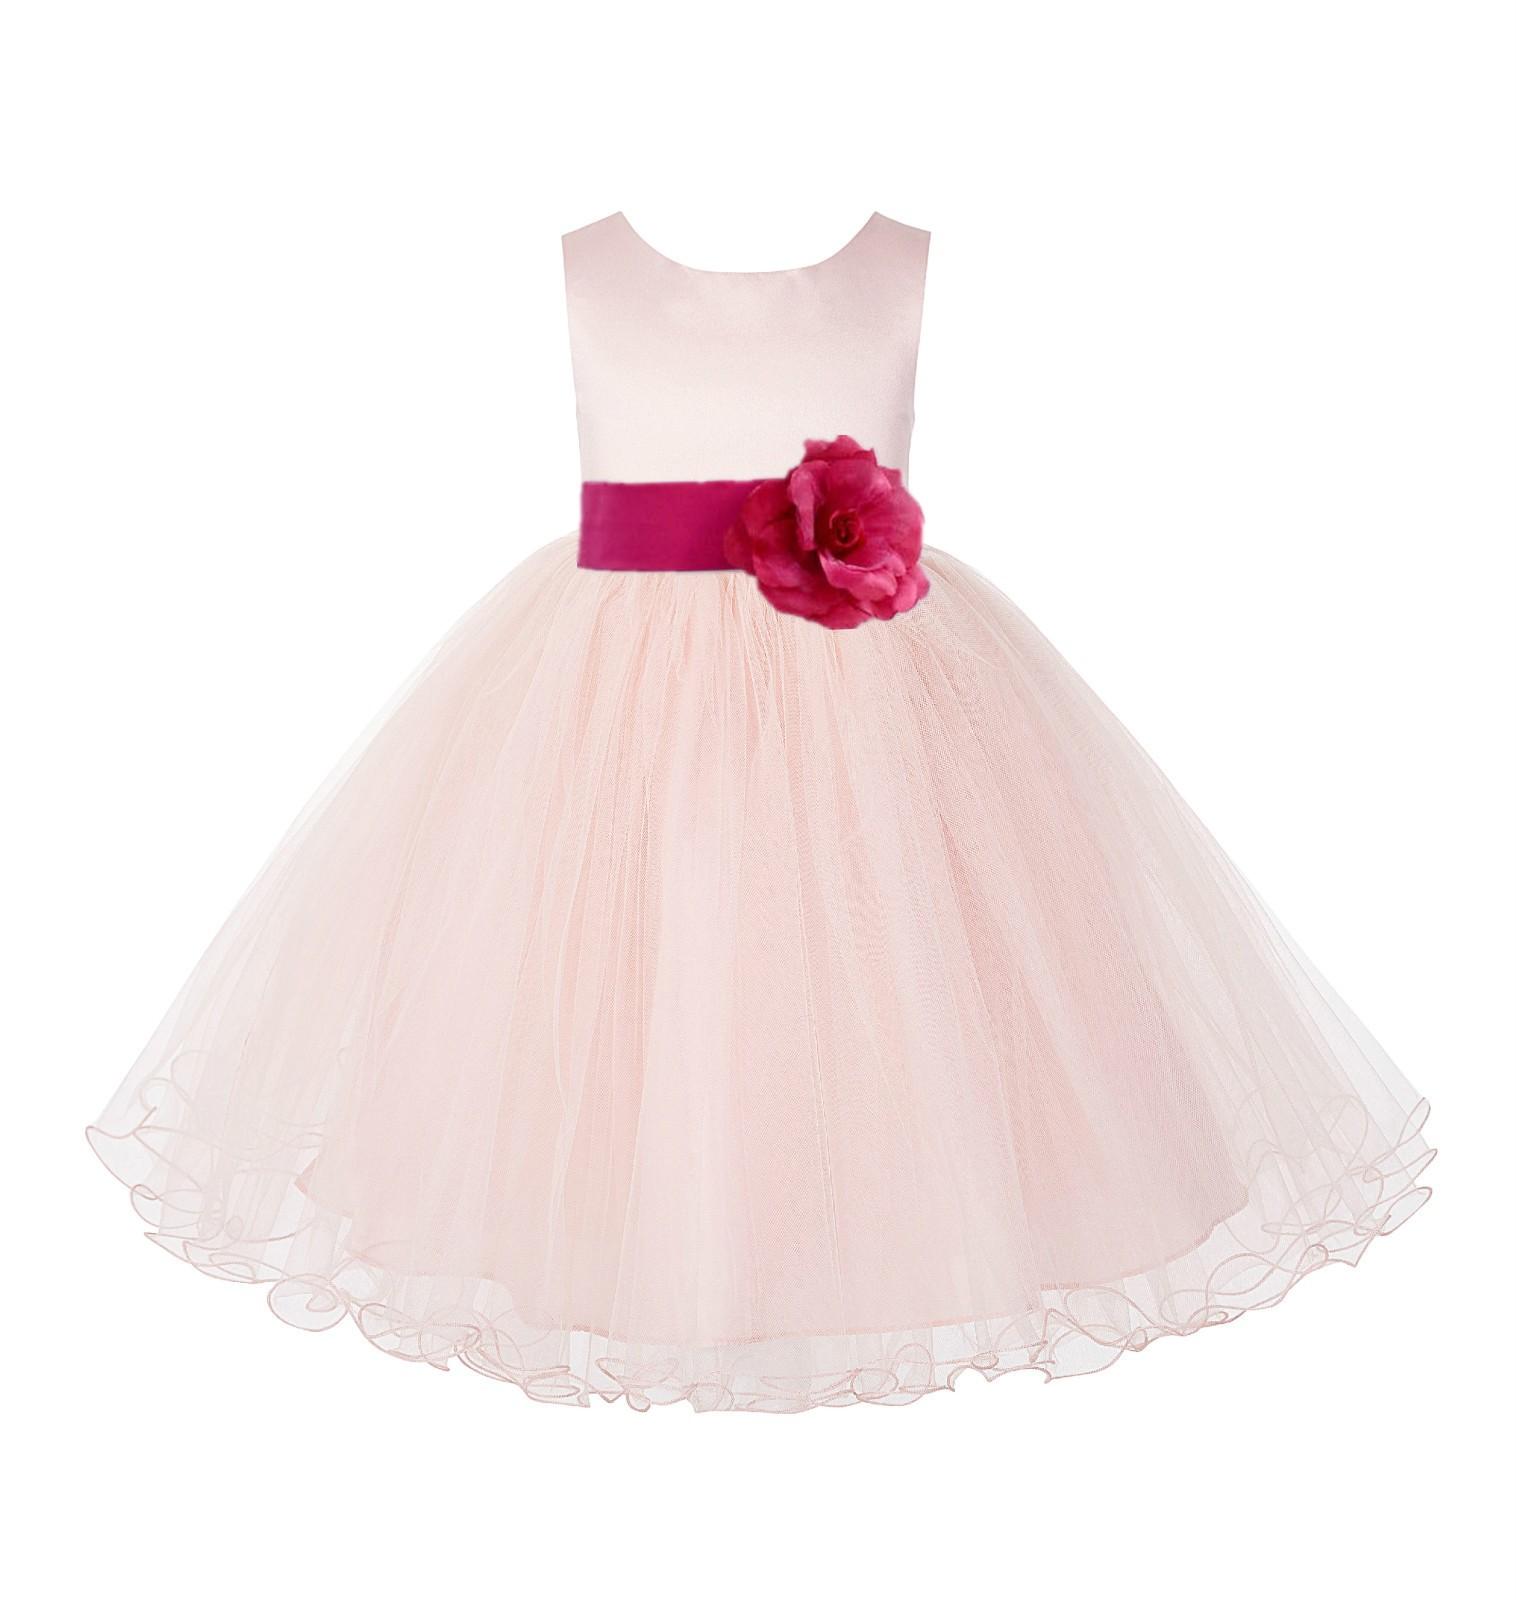 Blush PInk / Watermelon Tulle Rattail Edge Flower Girl Dress Wedding Bridesmaid 829T